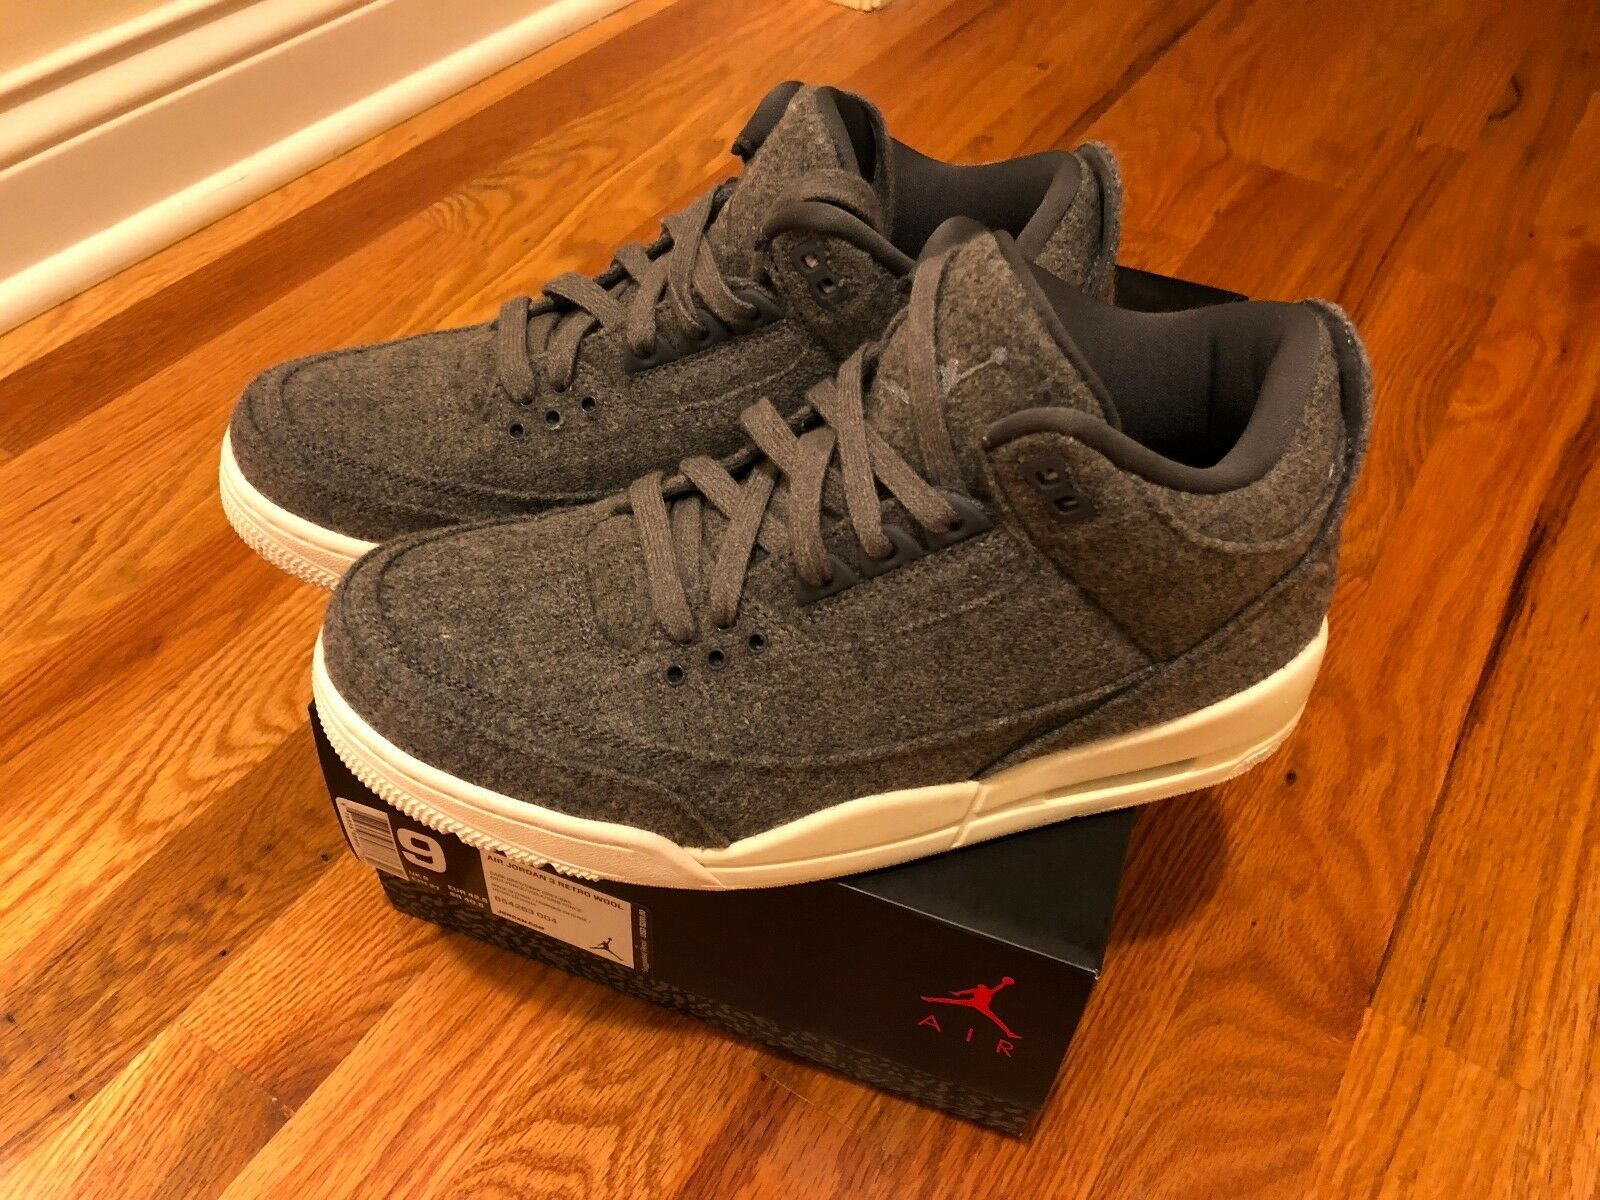 Nike Air Jordan 3 Retro Wool Comfortable The most popular shoes for men and women